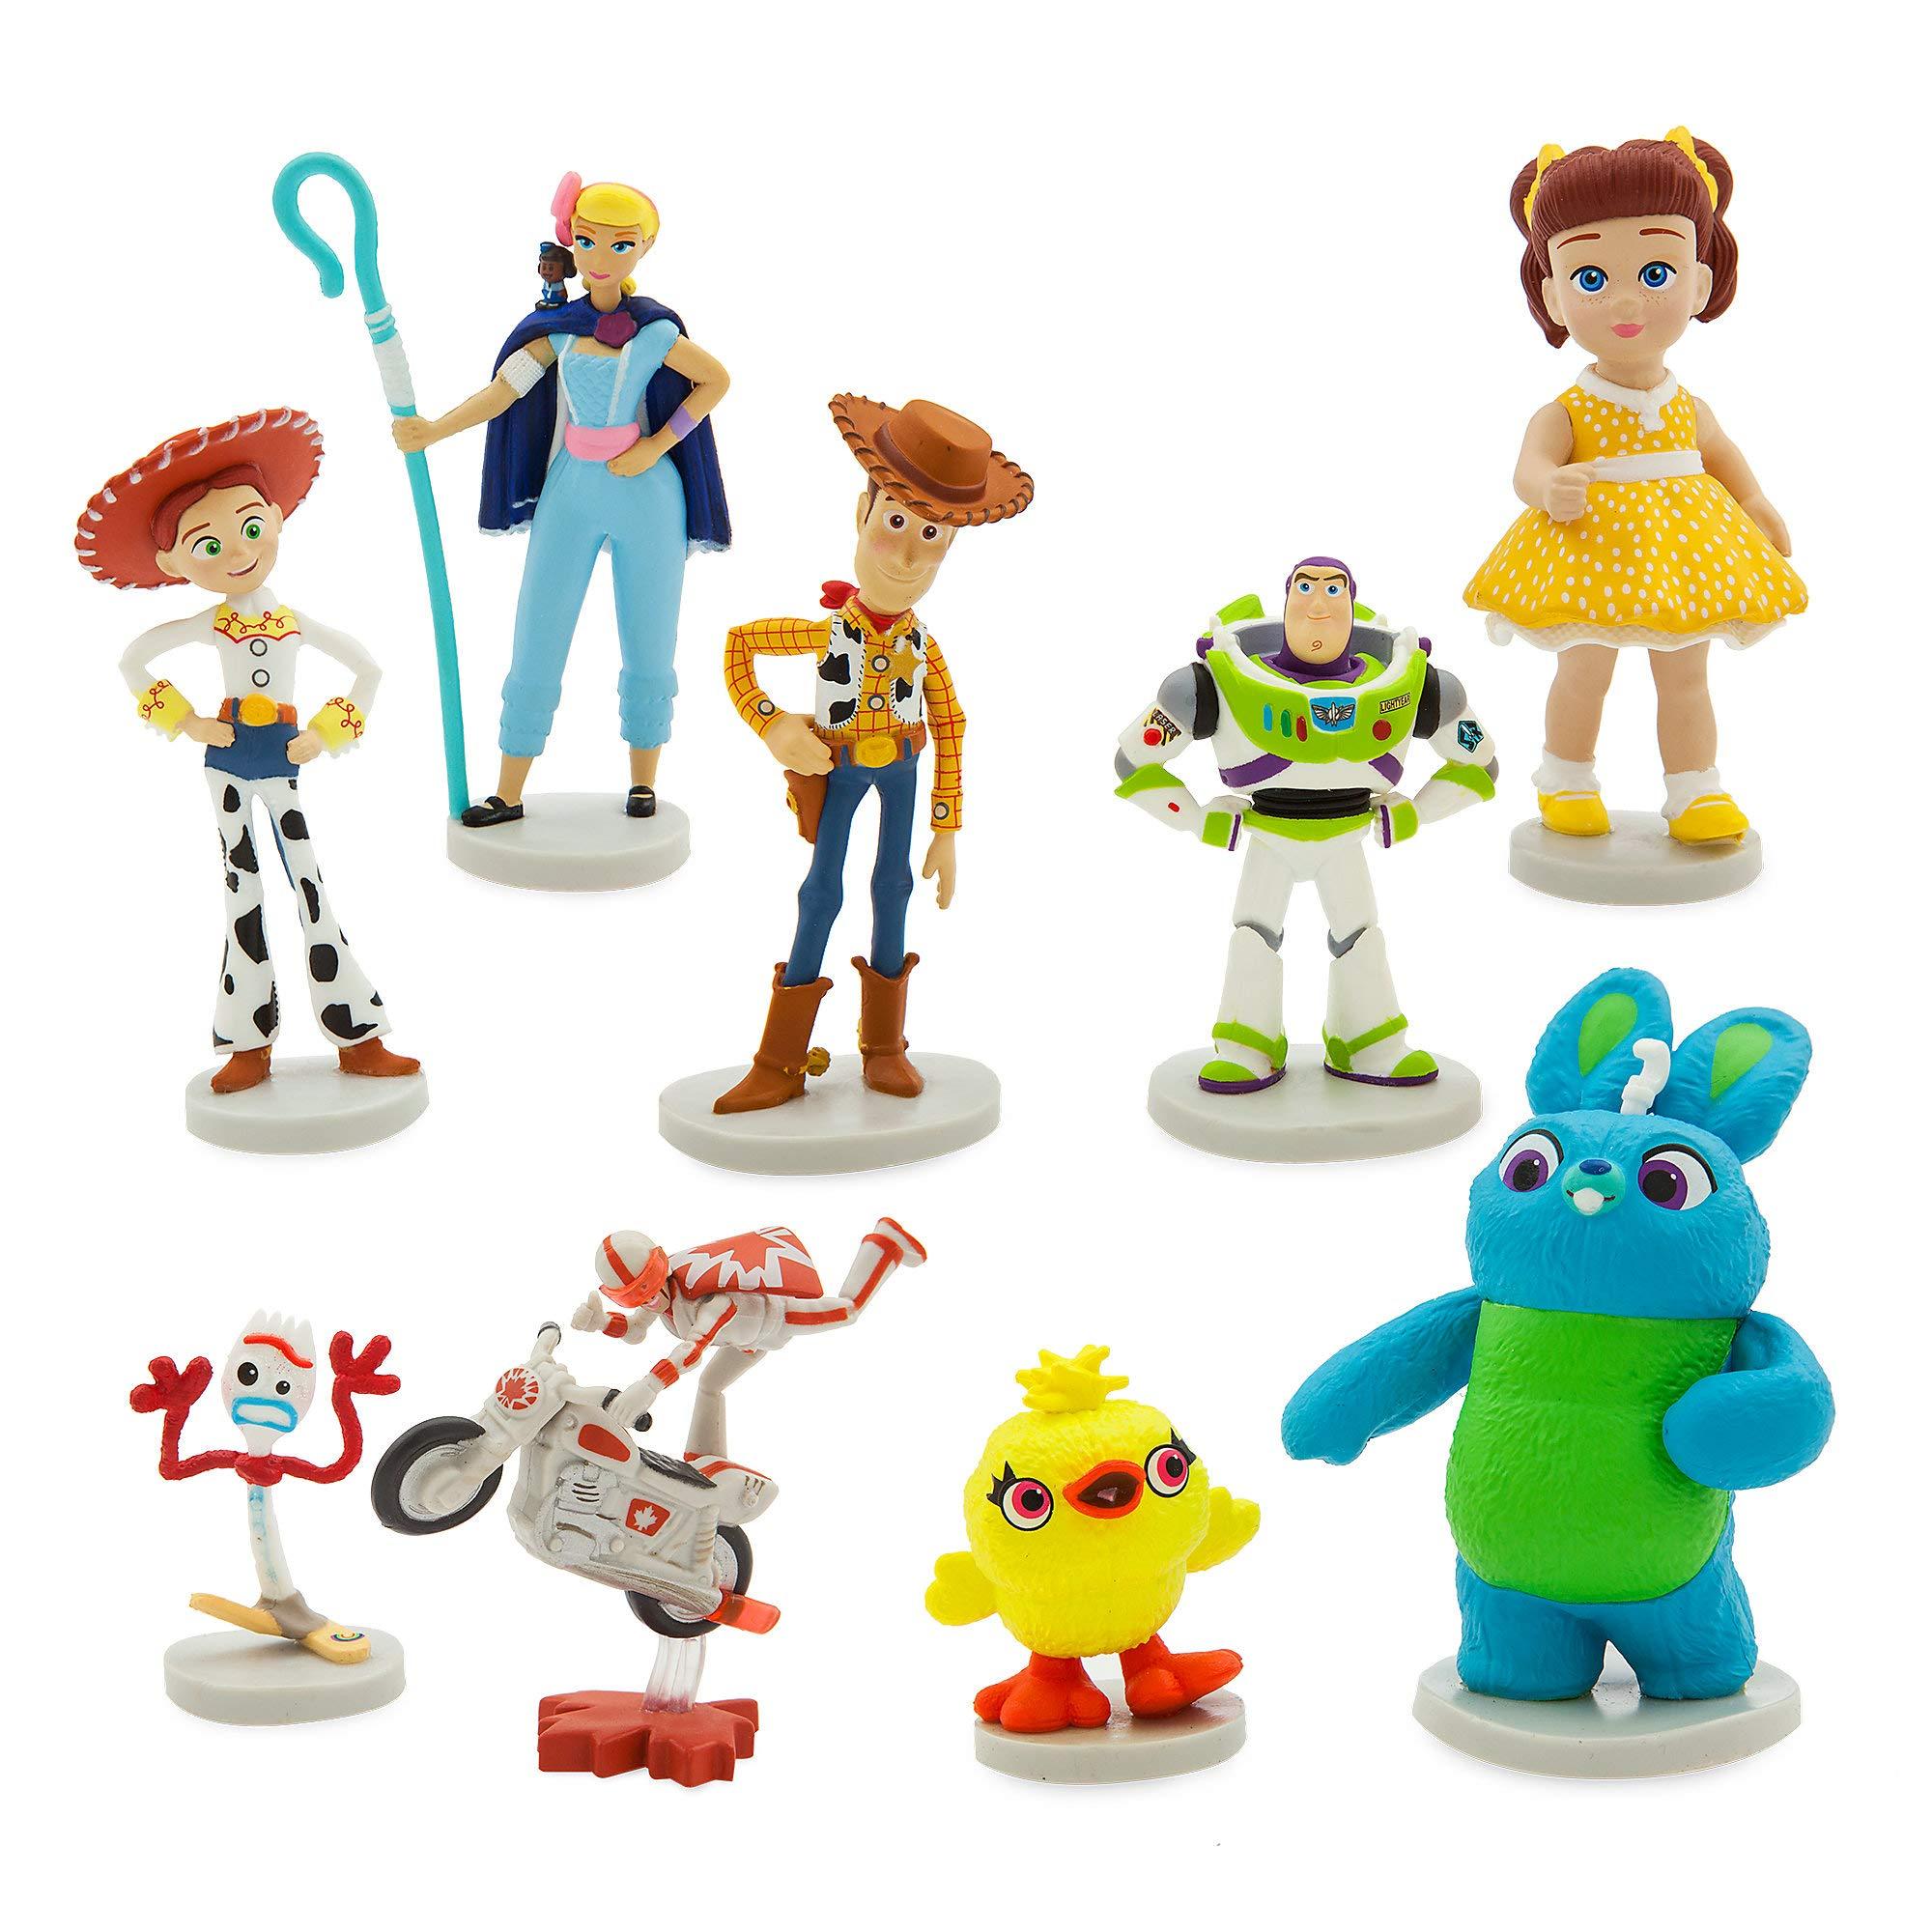 ویکالا · خرید  اصل اورجینال · خرید از آمازون · Disney Pixar Toy Story 4 Deluxe Figure Set wekala · ویکالا